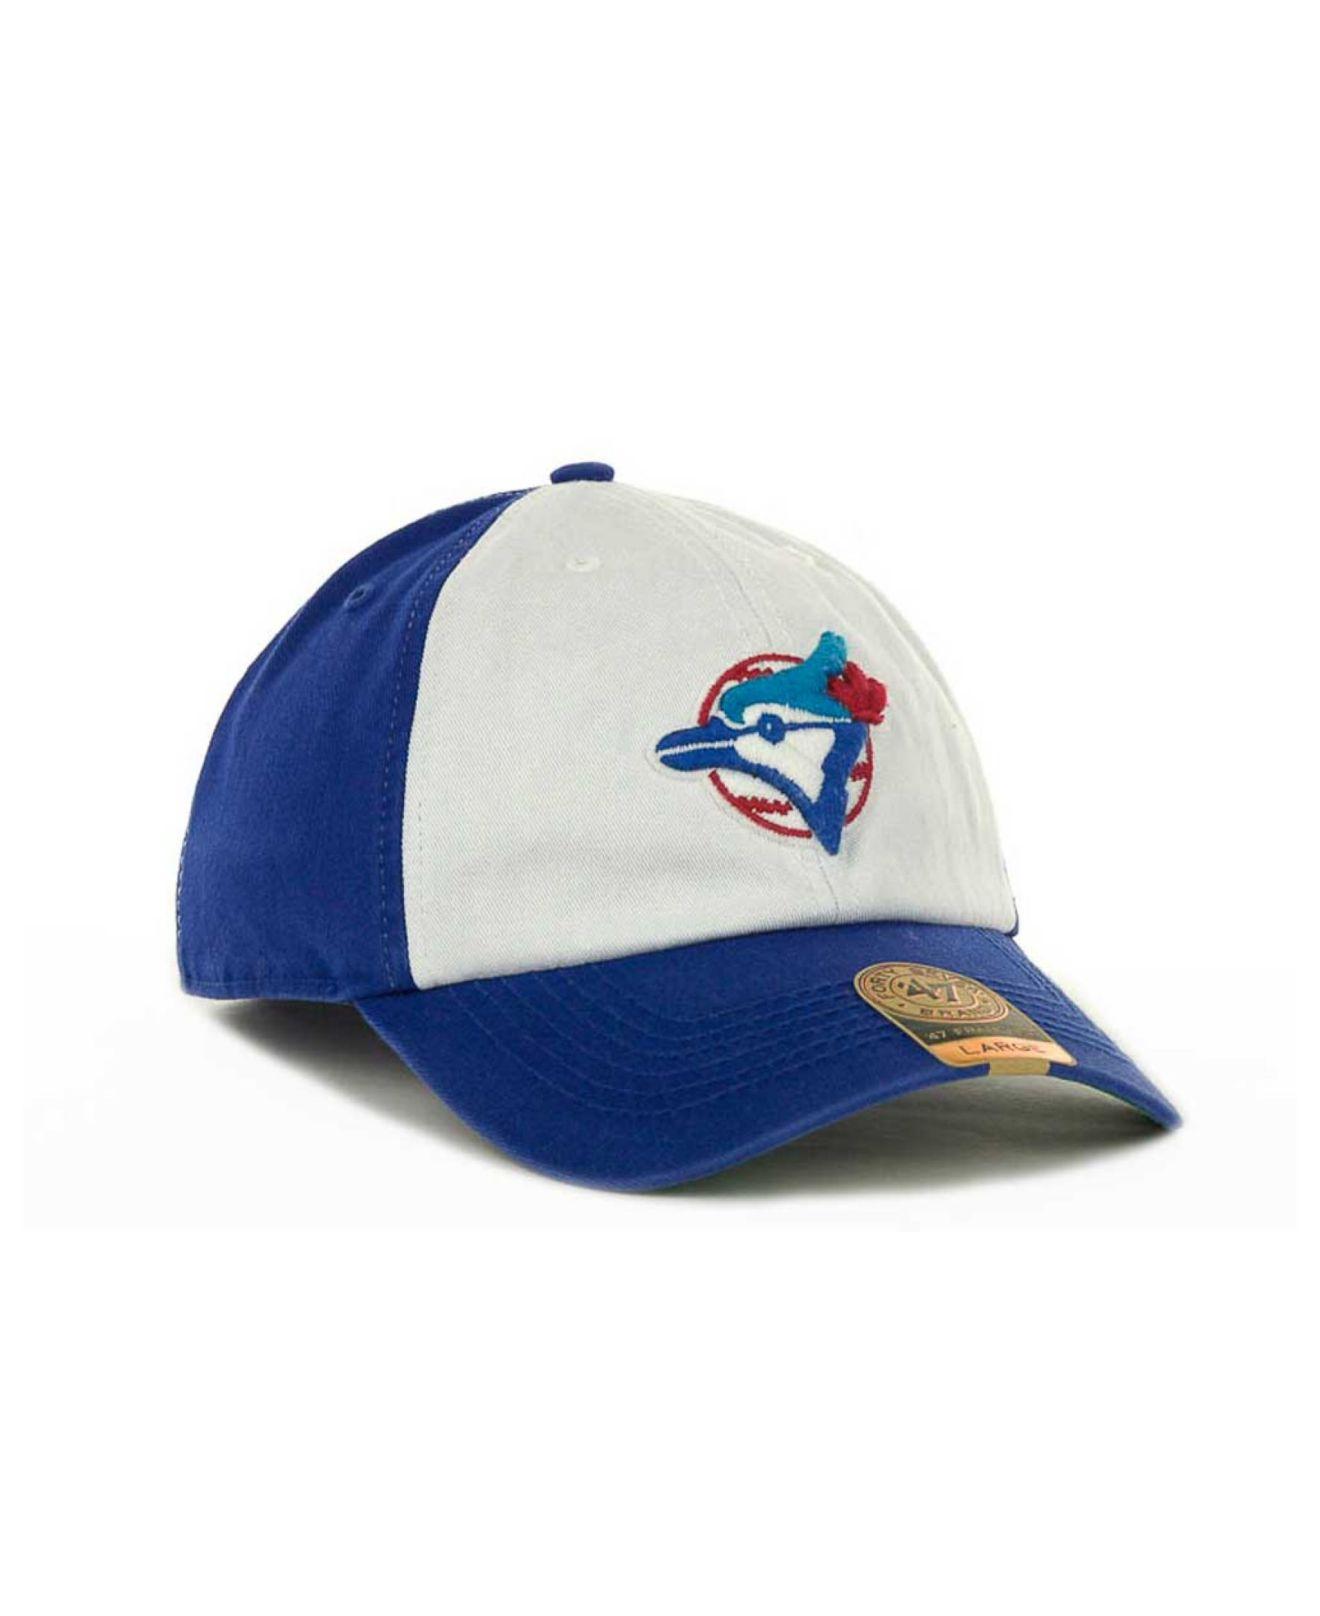 uk availability fc0aa 3d0fb ... hot lyst 47 brand toronto blue jays mlb 47 franchise cap in white for  men 86fa2